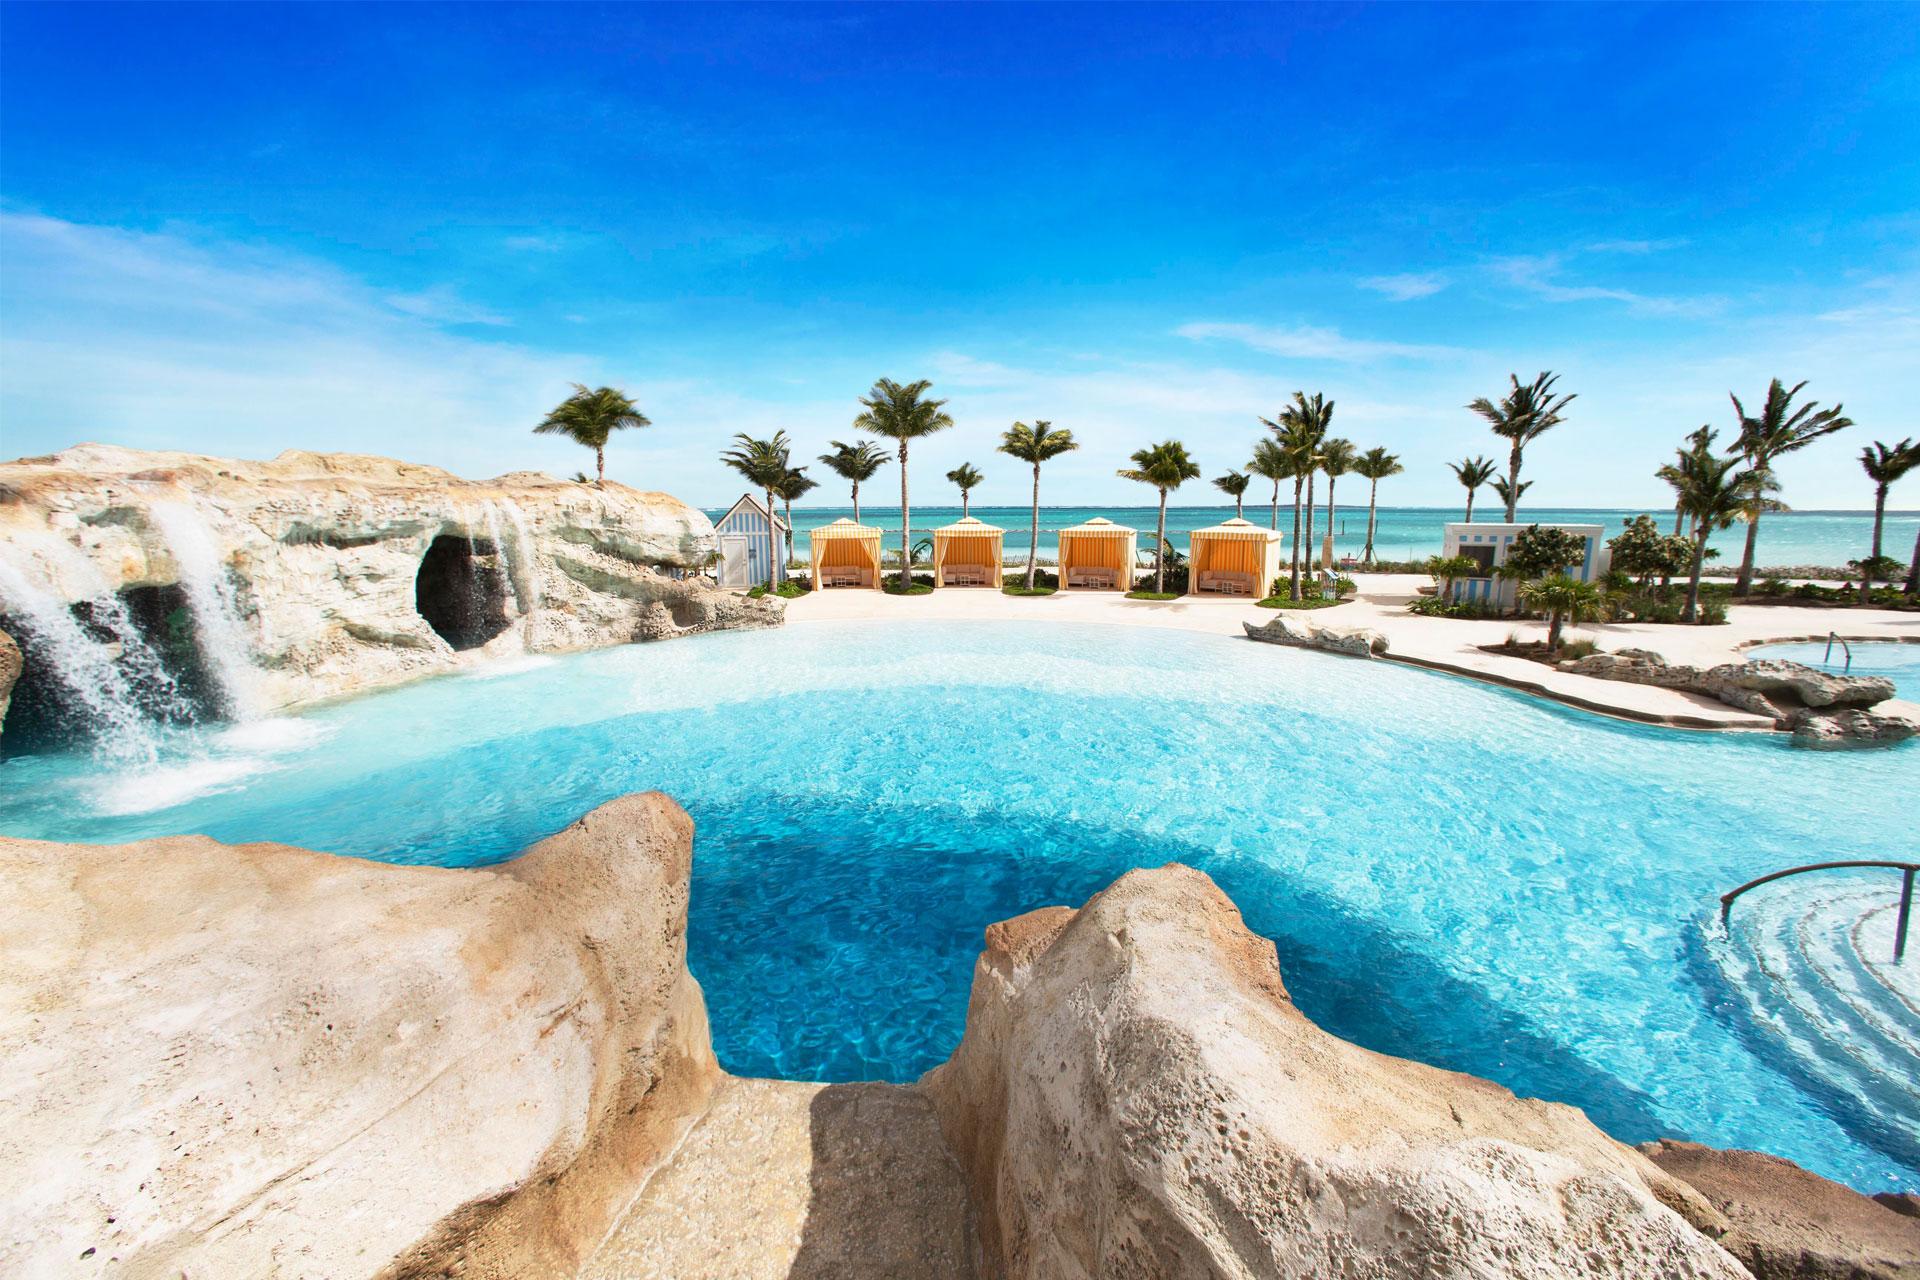 Baha Mar Blue Hole Pool; Courtesy of Baha Mar Resort